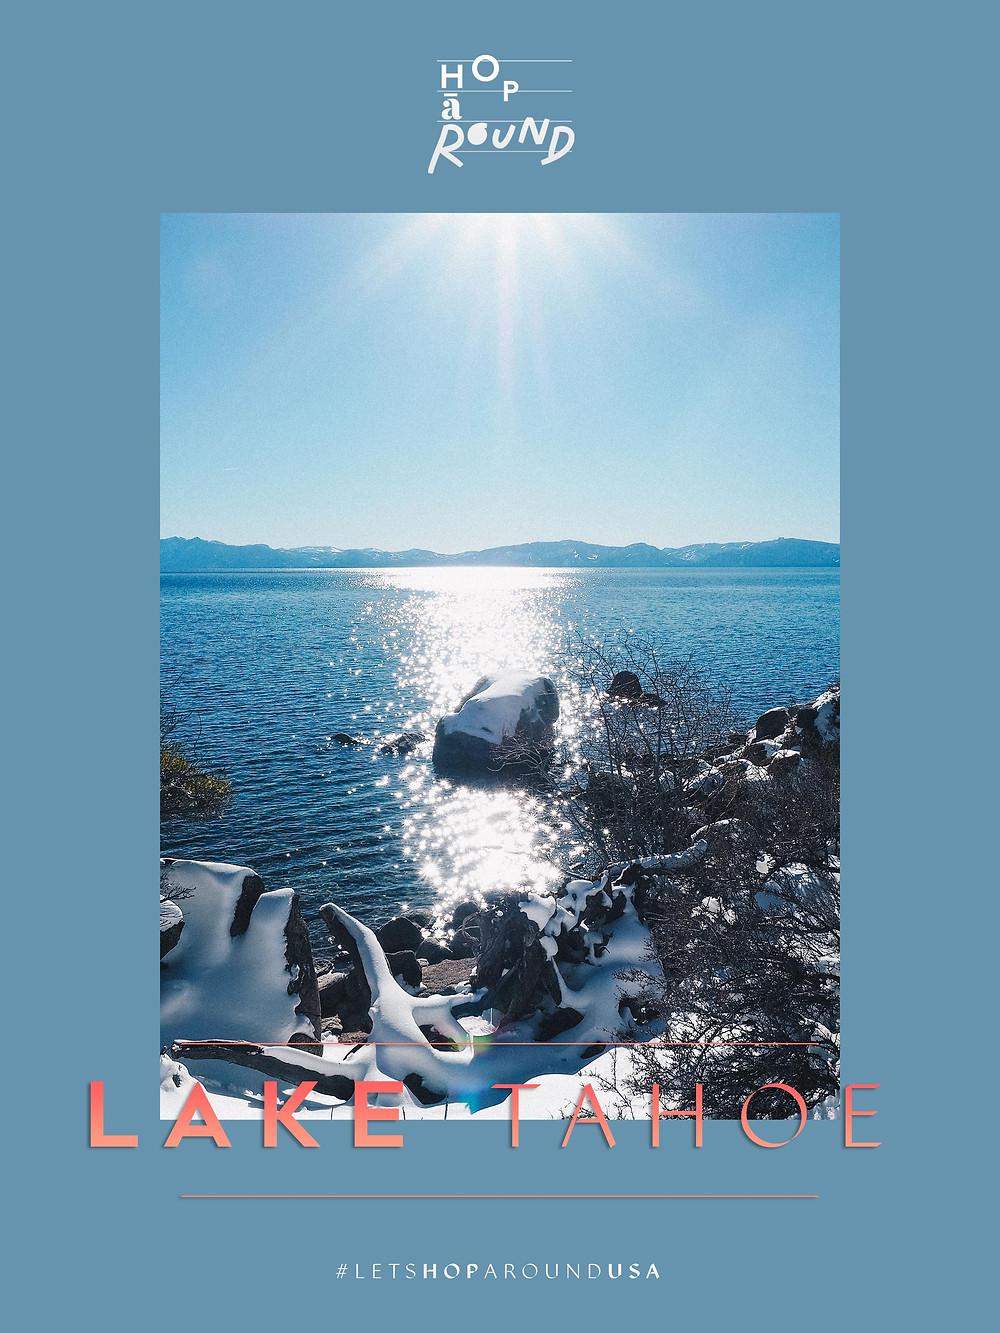 Lake Tahoe จุดชมวิว เที่ยวอเมริกา โรดทริป America West Coast Road Trip USA เที่ยวอเมริกาด้วยตัวเอง เช่ารถขับ รอบอเมริกา ซานฟรานซิสโก แคลิฟอเนียร์ ซีแอตเทิล ลอสแองเจลิส ซานดิเอโก้ พอร์ทแลนด์ Portland San Diego Los Angeles Seattle California ร้านอร่อย ร้านอาหาร คาเฟ่ ช็อปปิ้ง ชอปปิ้ง จุดน่าแวะในอเมริกา ขับรถรอบอเมริกา